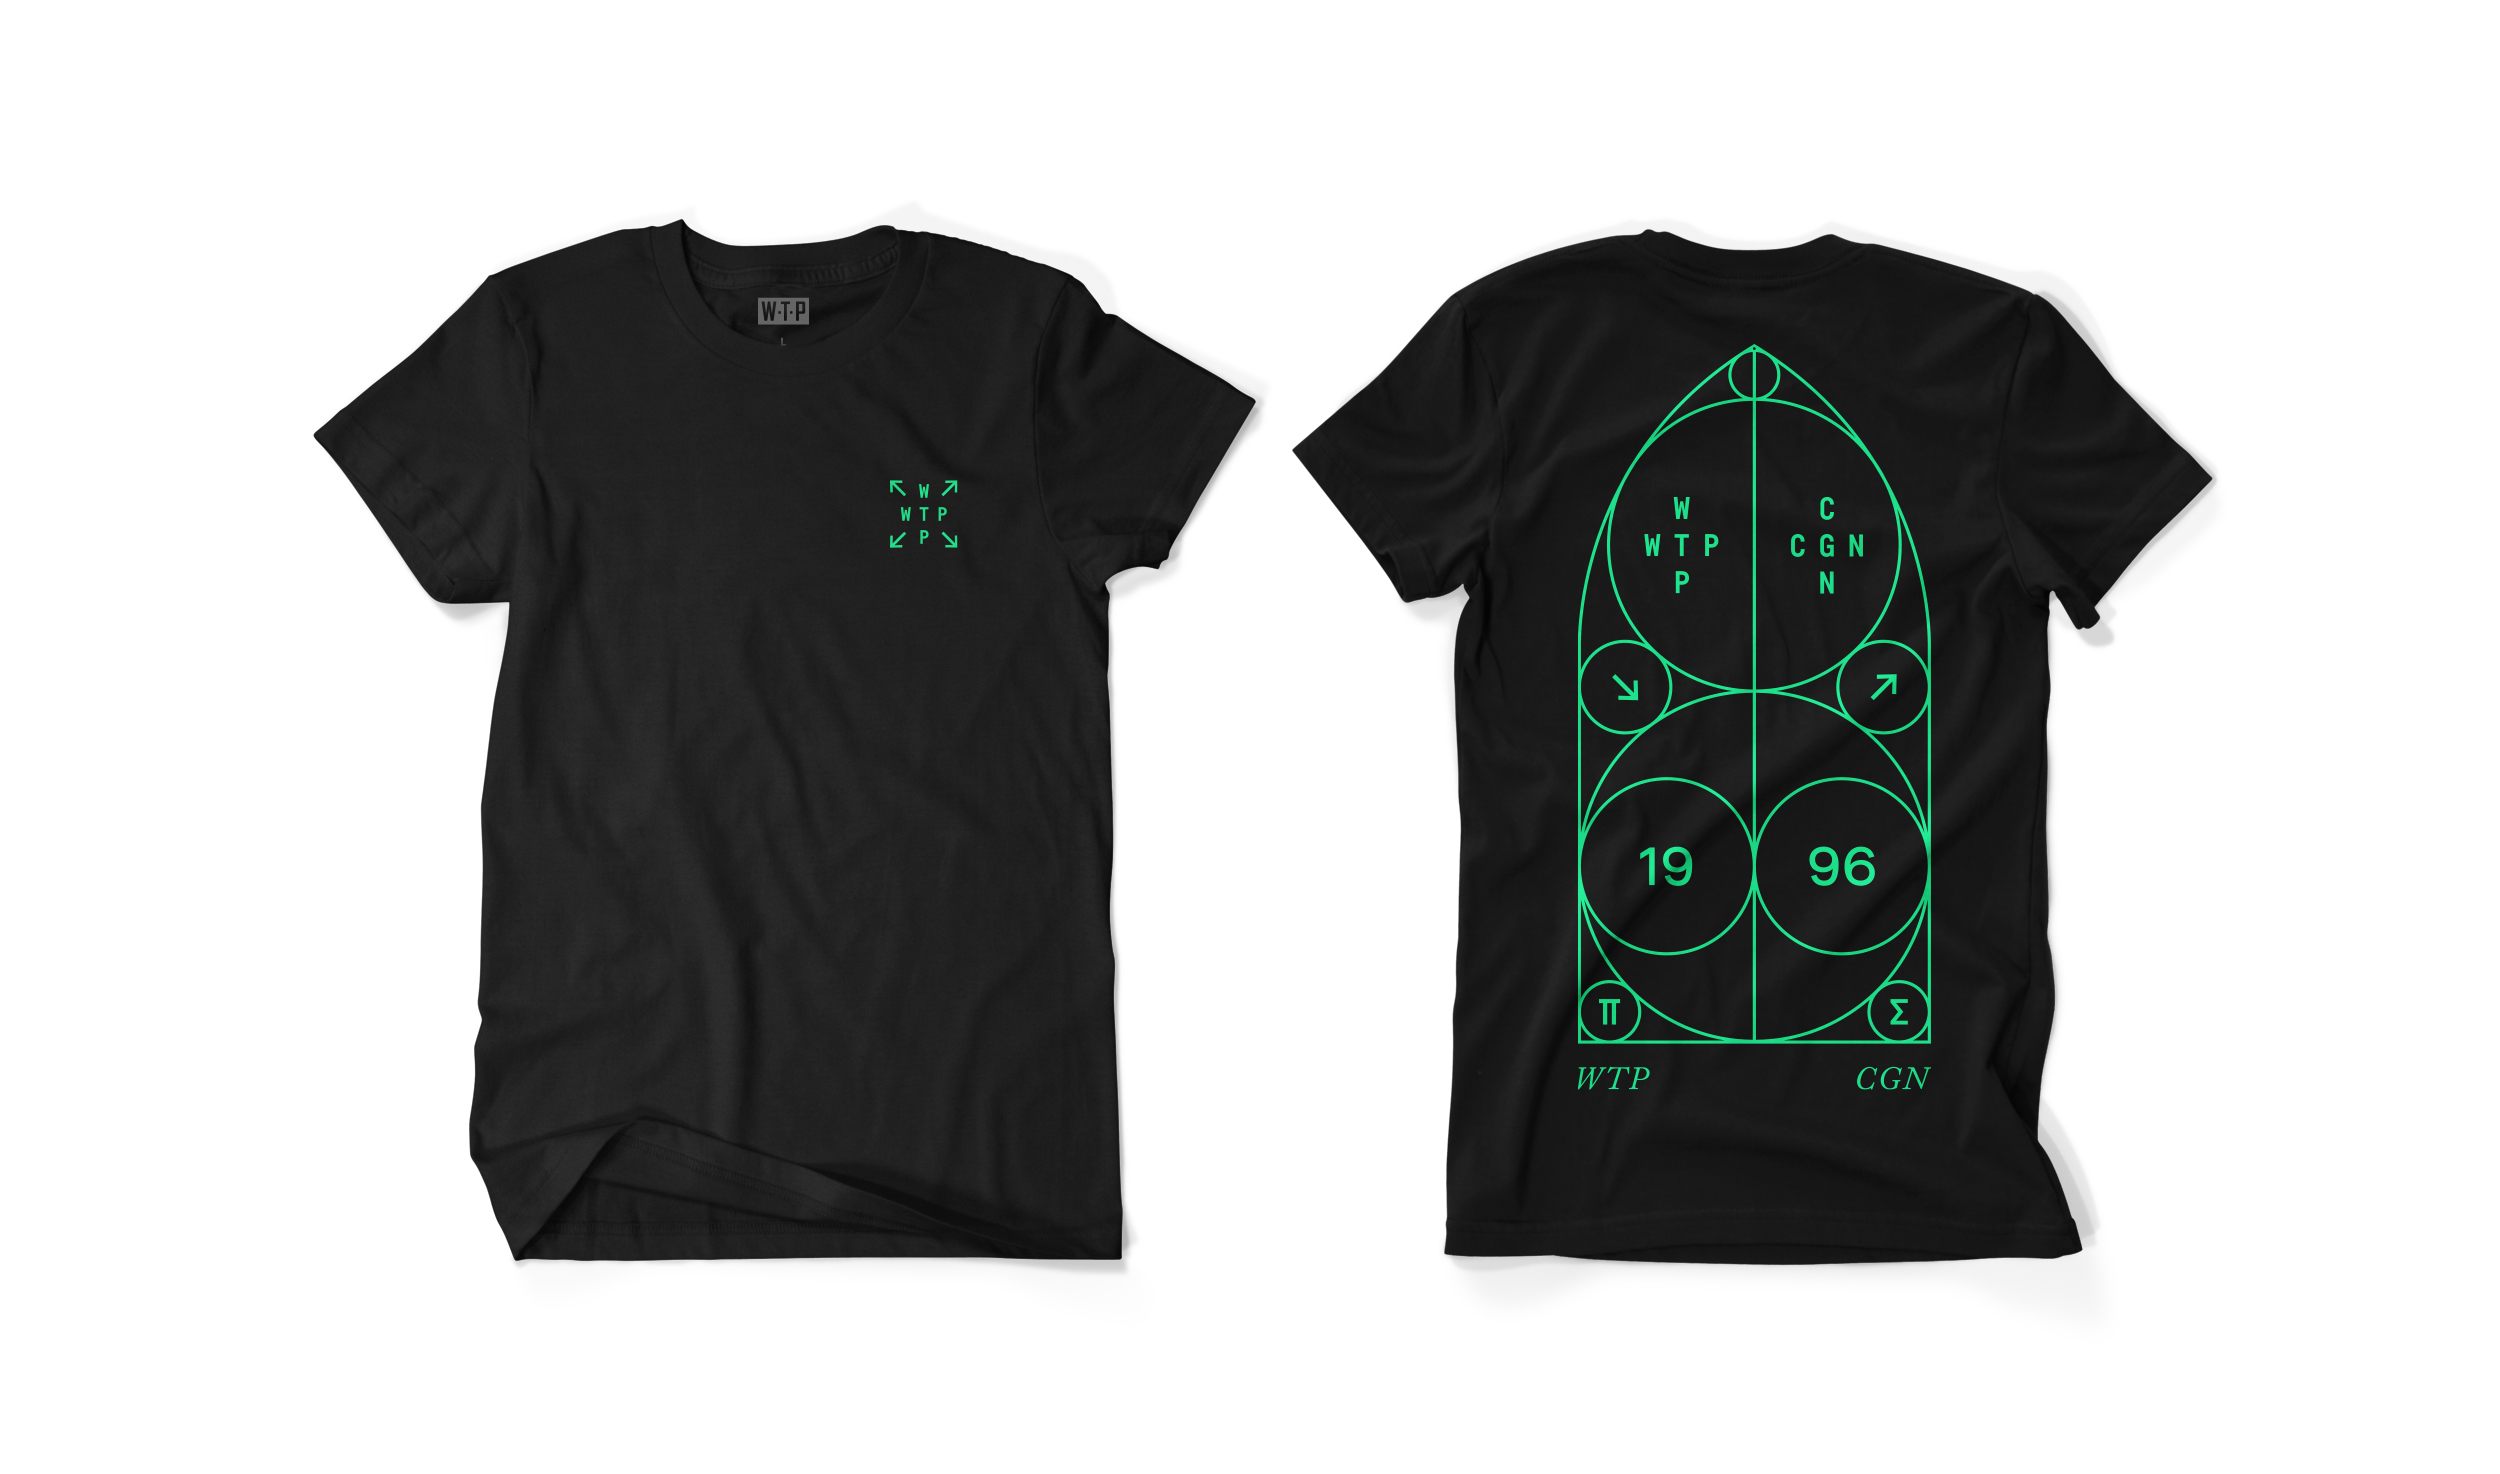 Wethepeople BMX Architect Bullet T-Shirt in schwarz